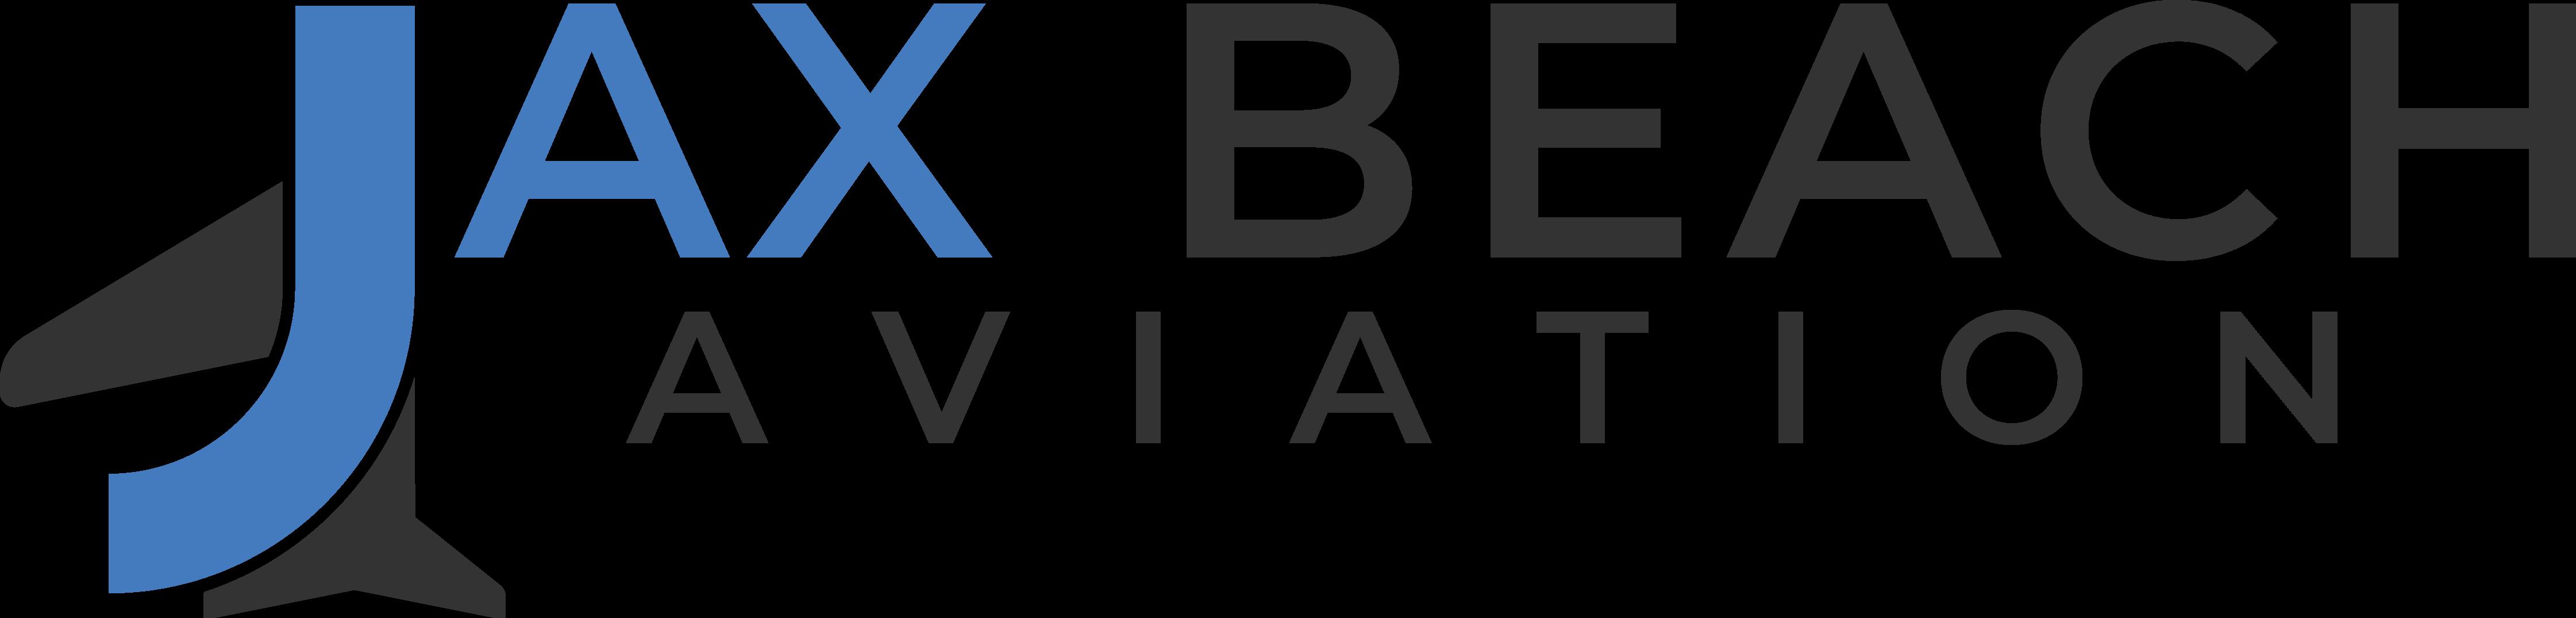 Jax Beach Aviation